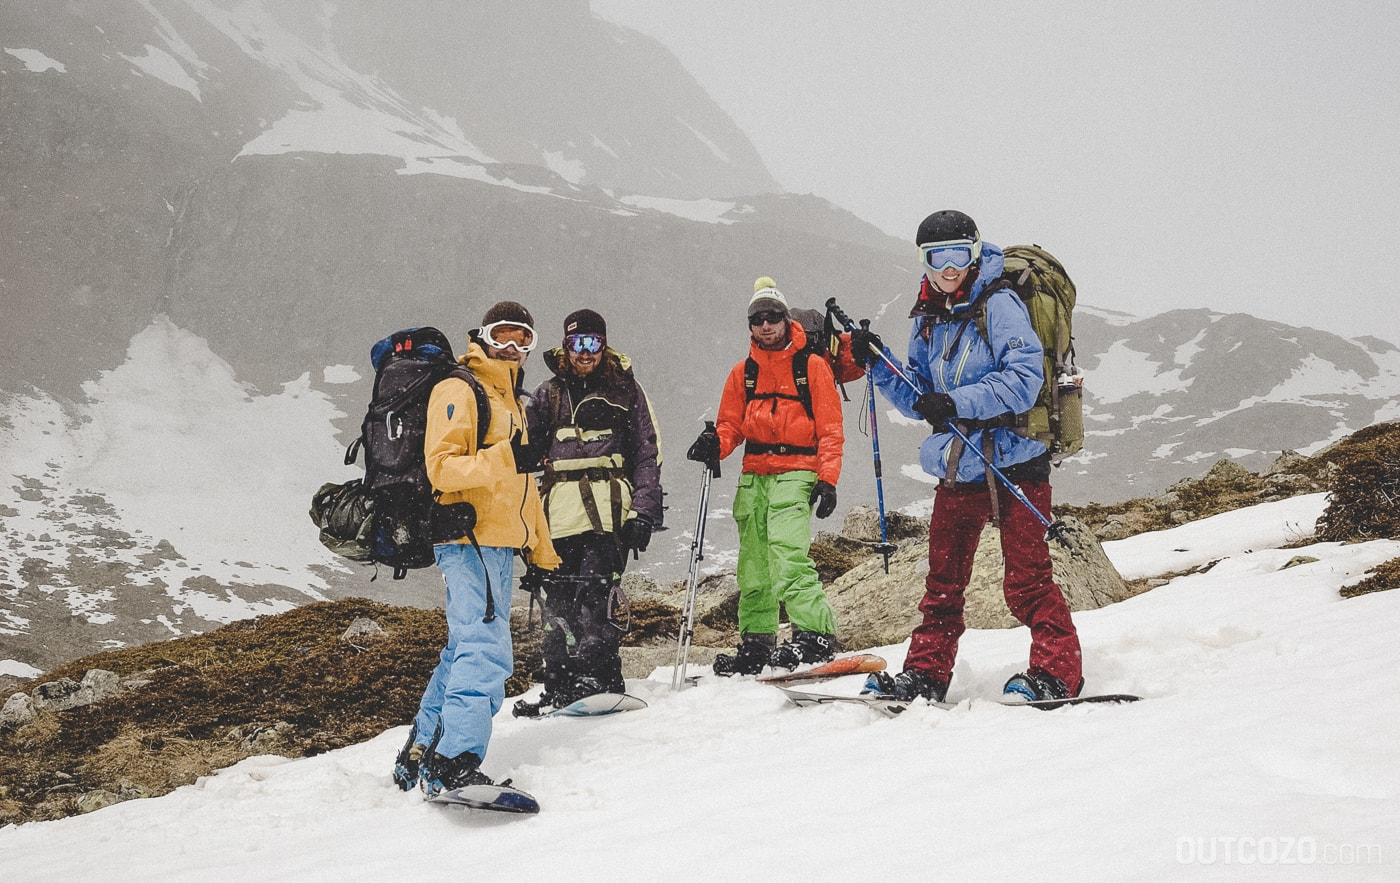 Snowboard-Crew